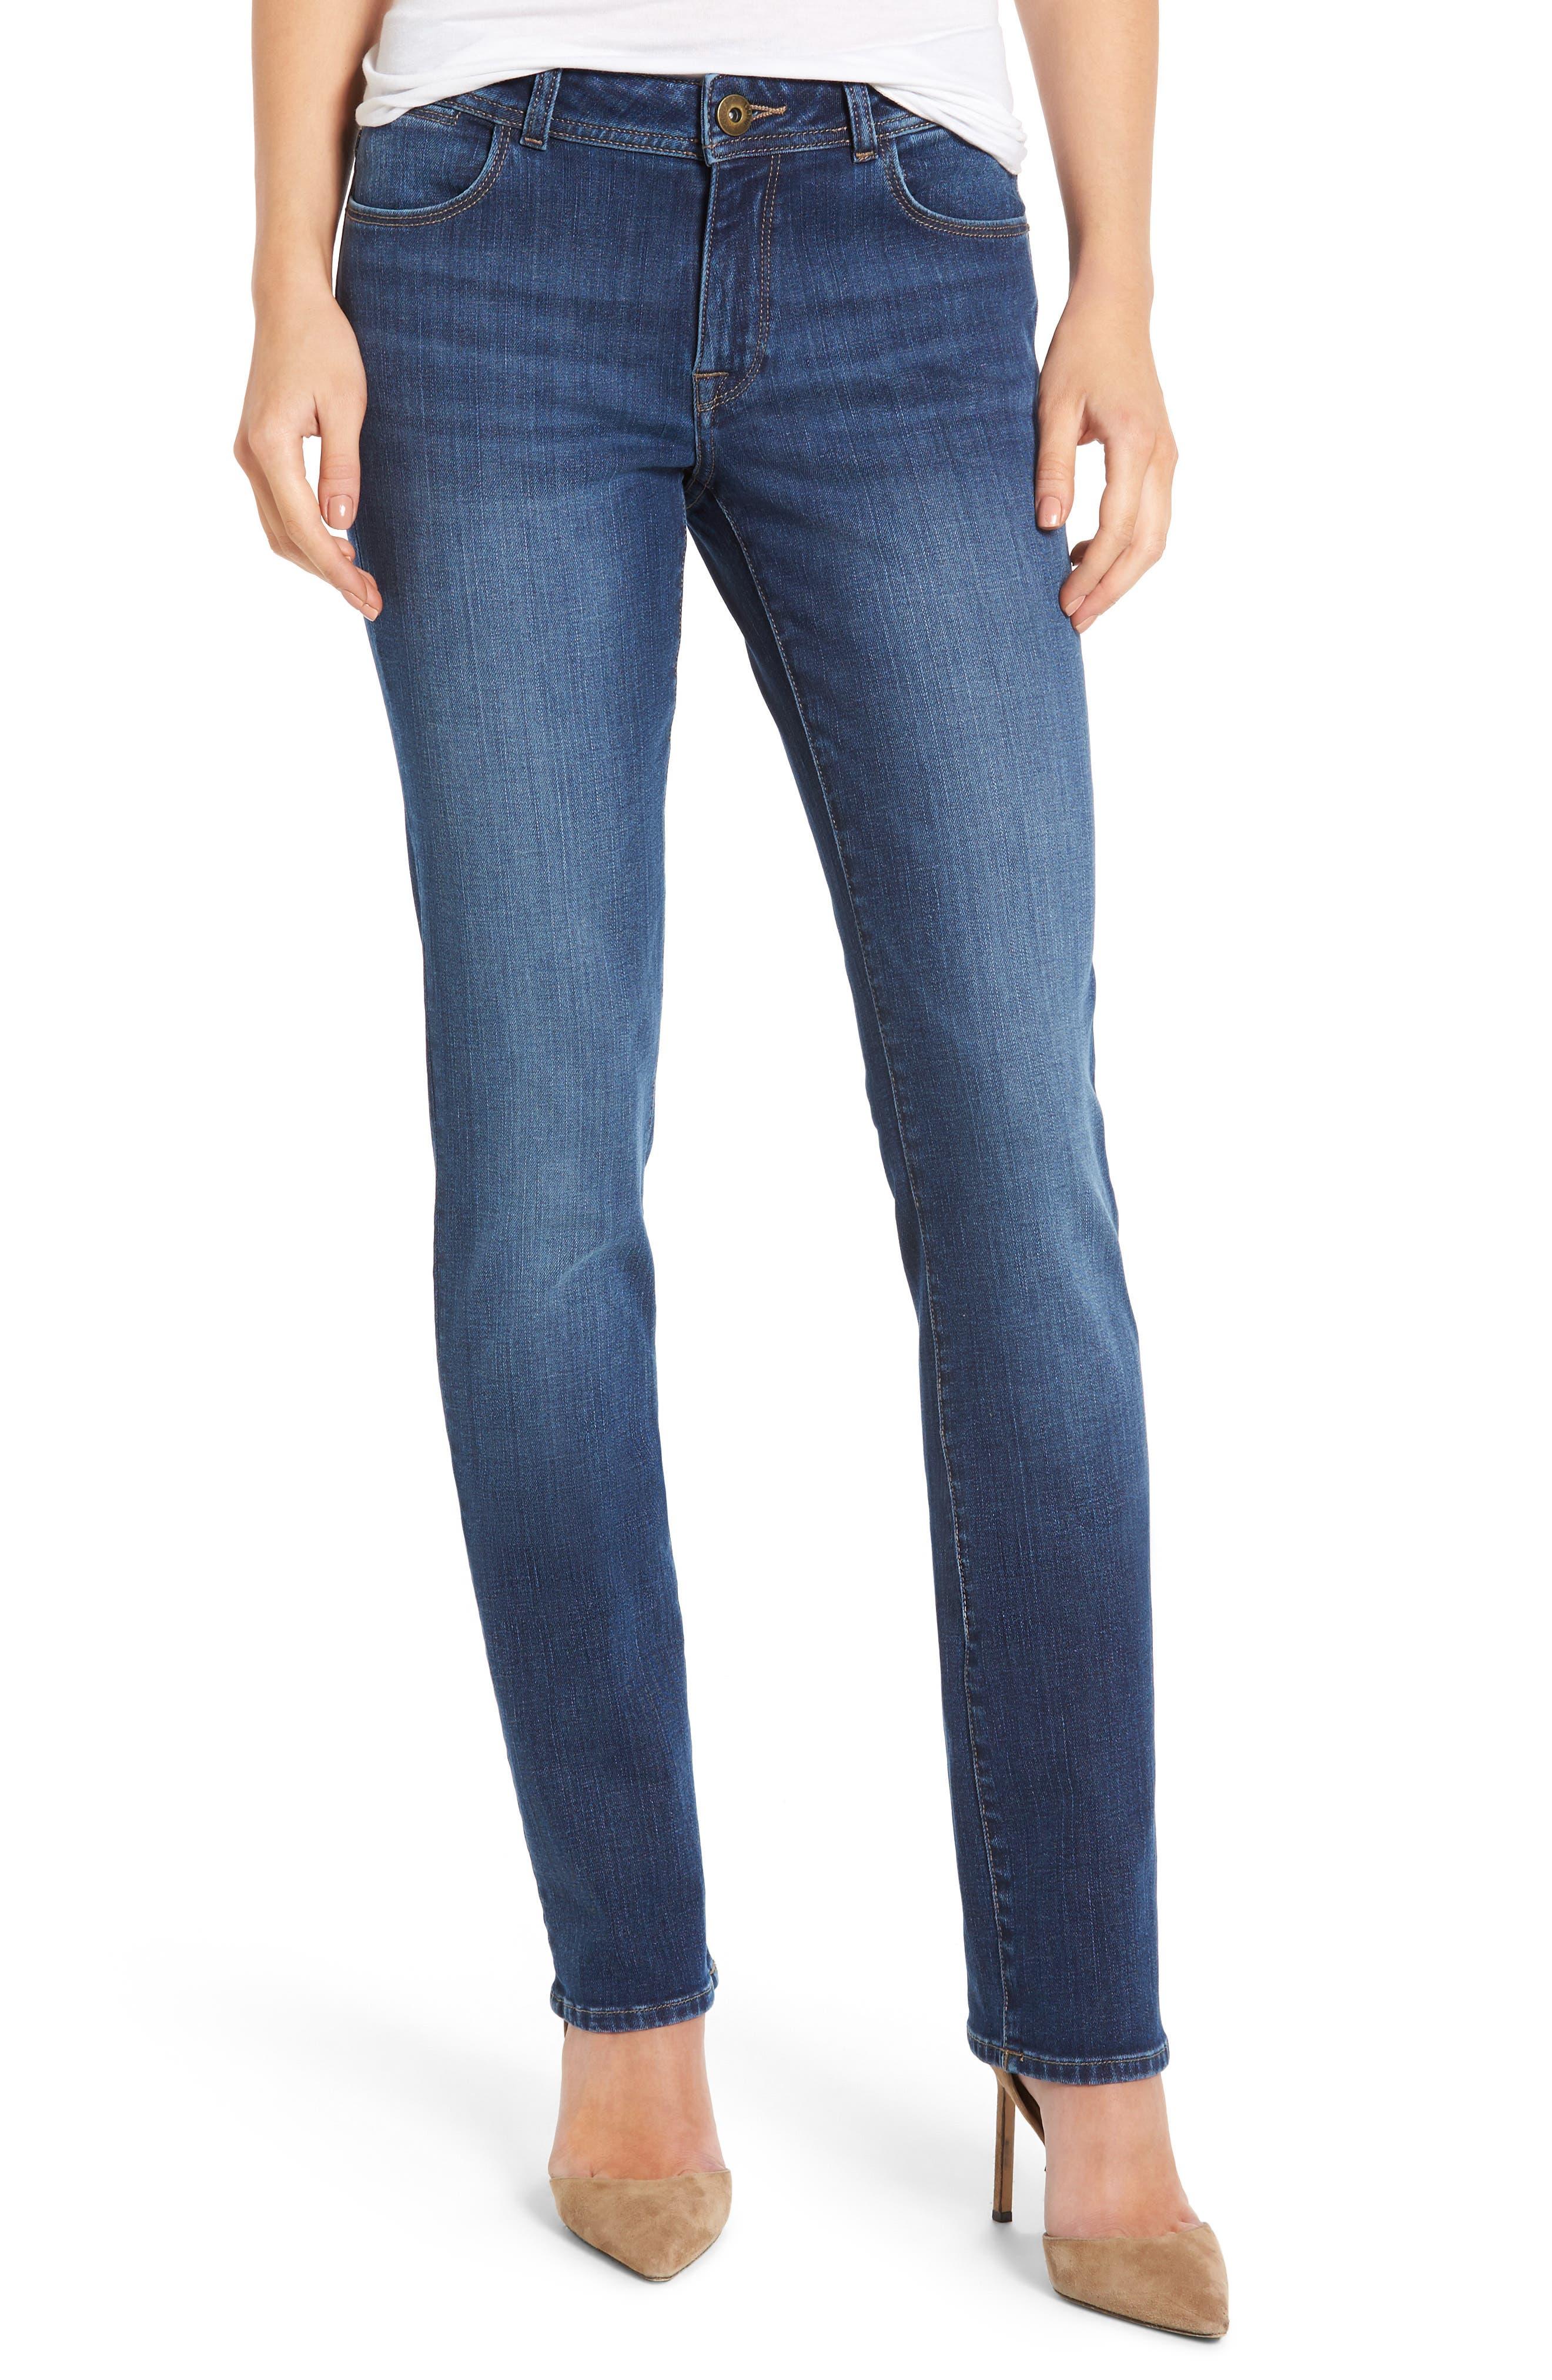 Coco Curvy Straight Leg Jeans,                             Main thumbnail 1, color,                             405